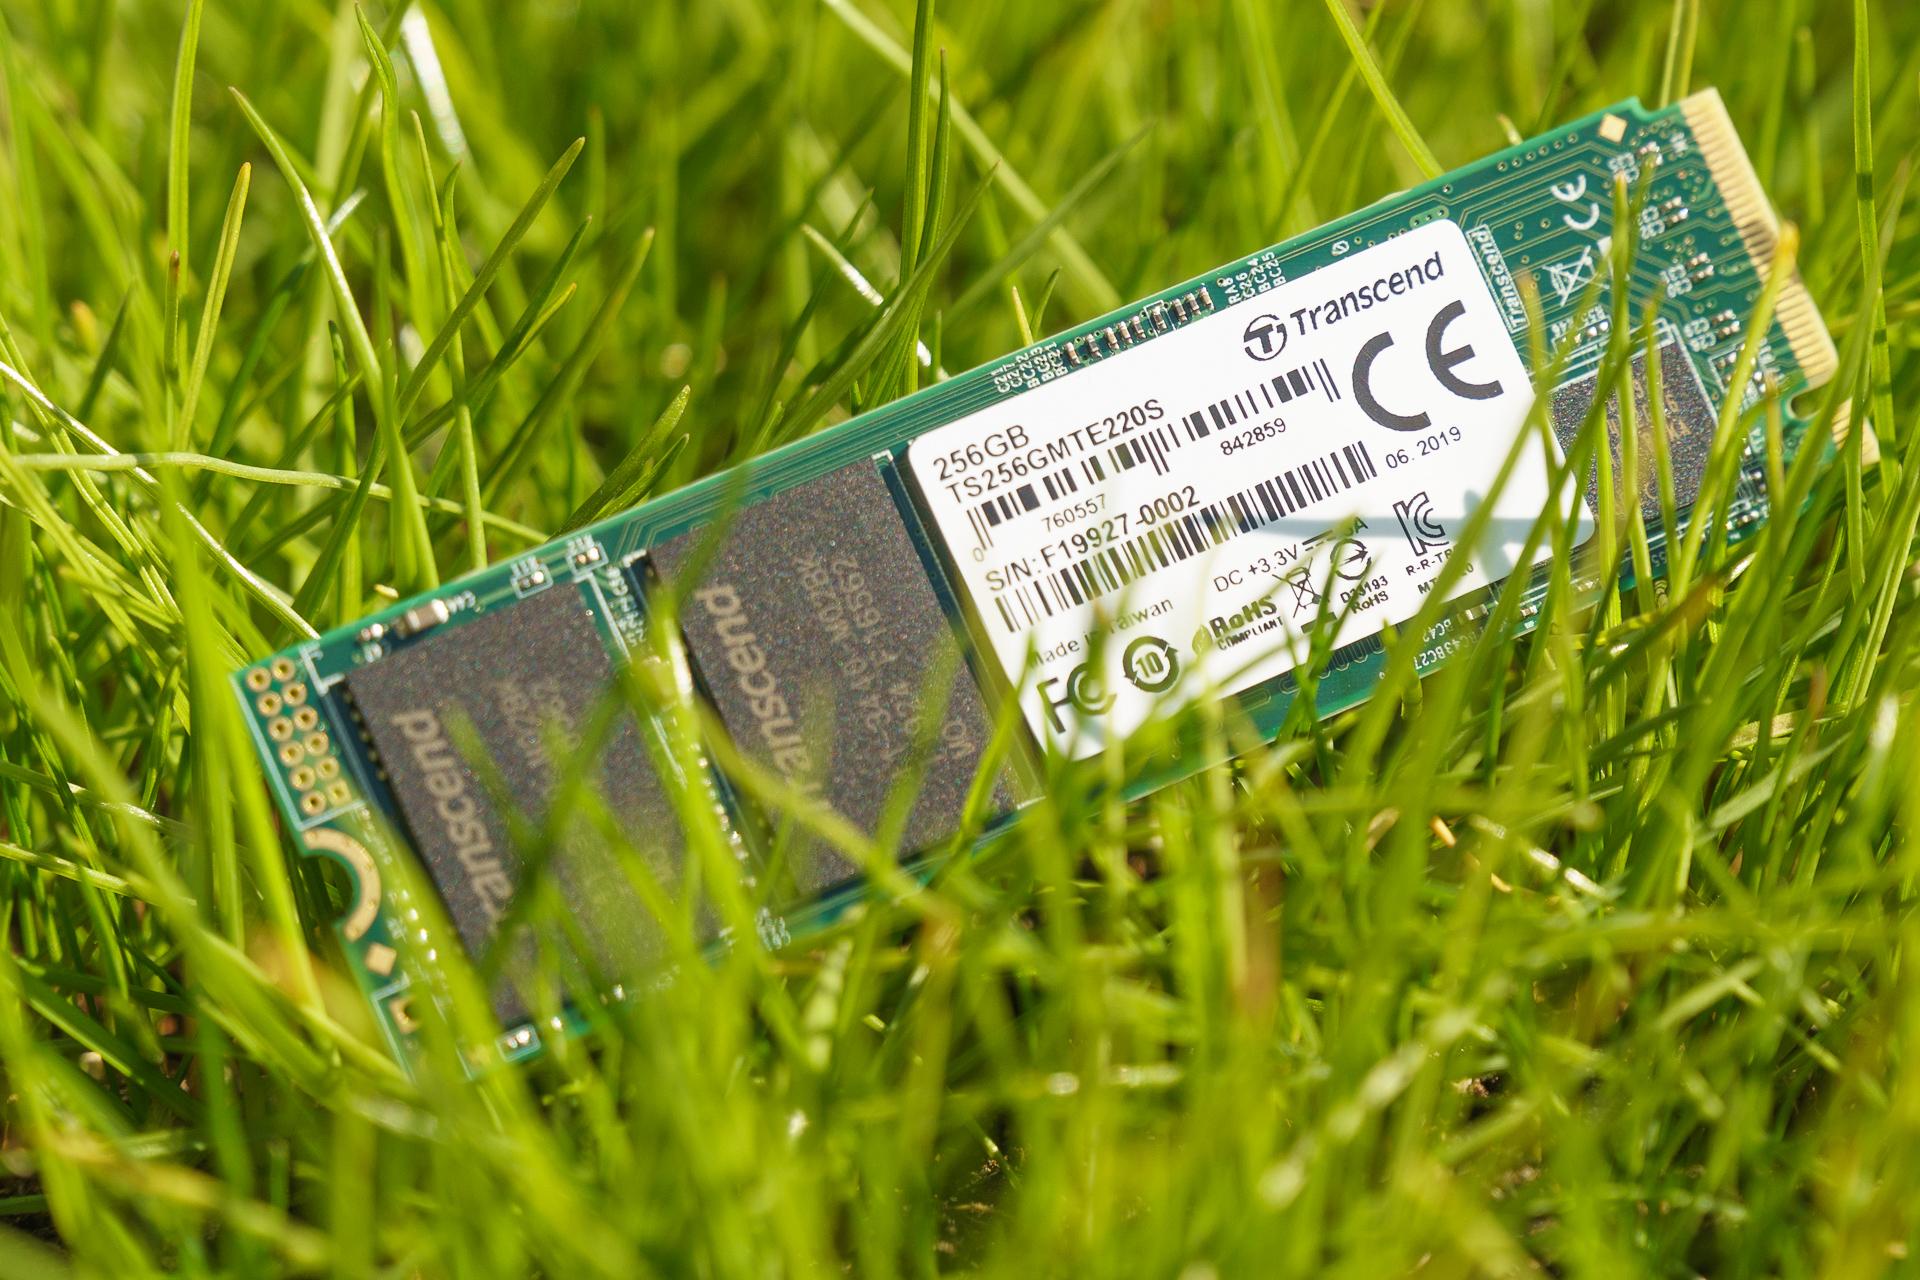 Recenzja dysku Transcend SSD S220 - wart uwagi